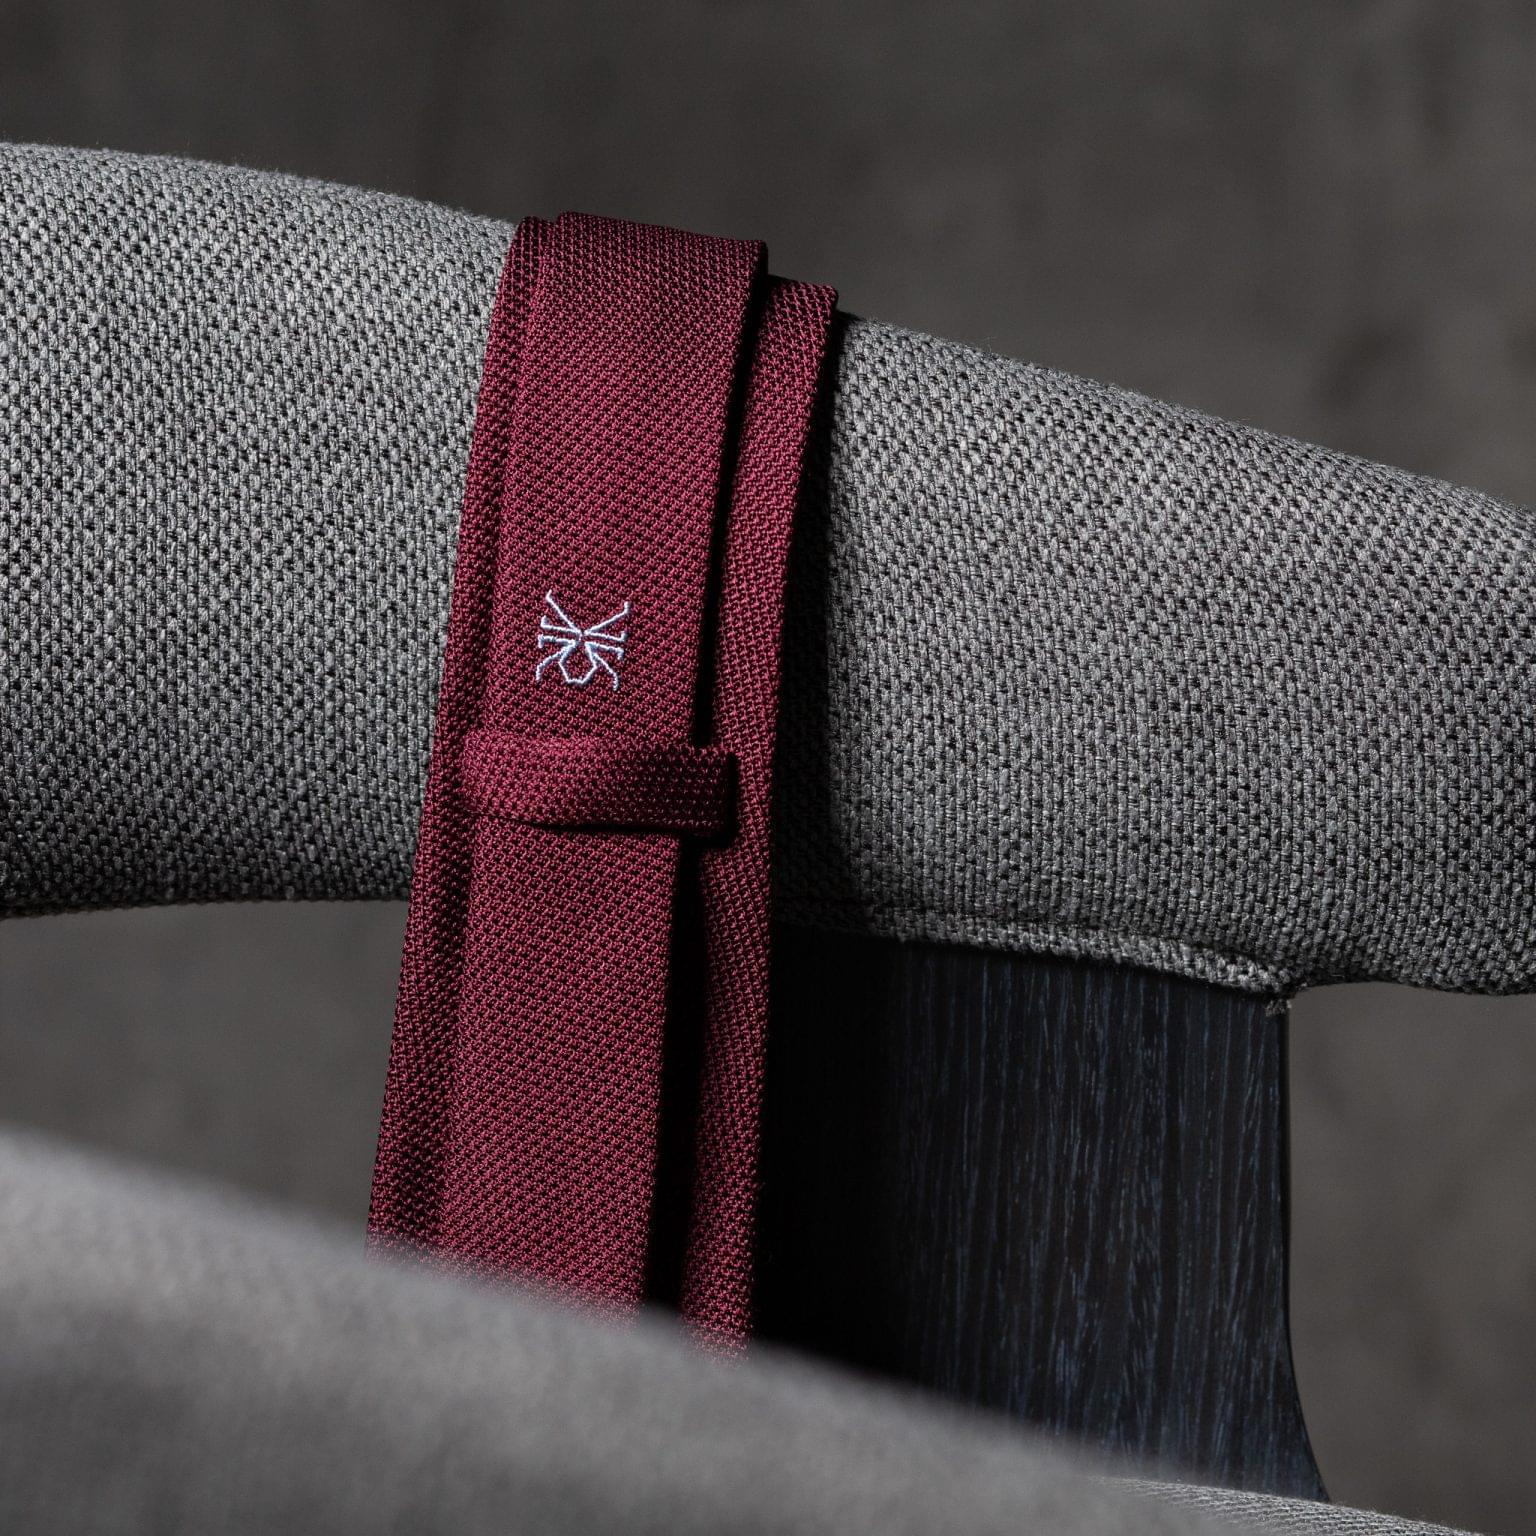 GRENADINE-0278-Tie-Initials-Corbata-Iniciales-The-Seelk-4